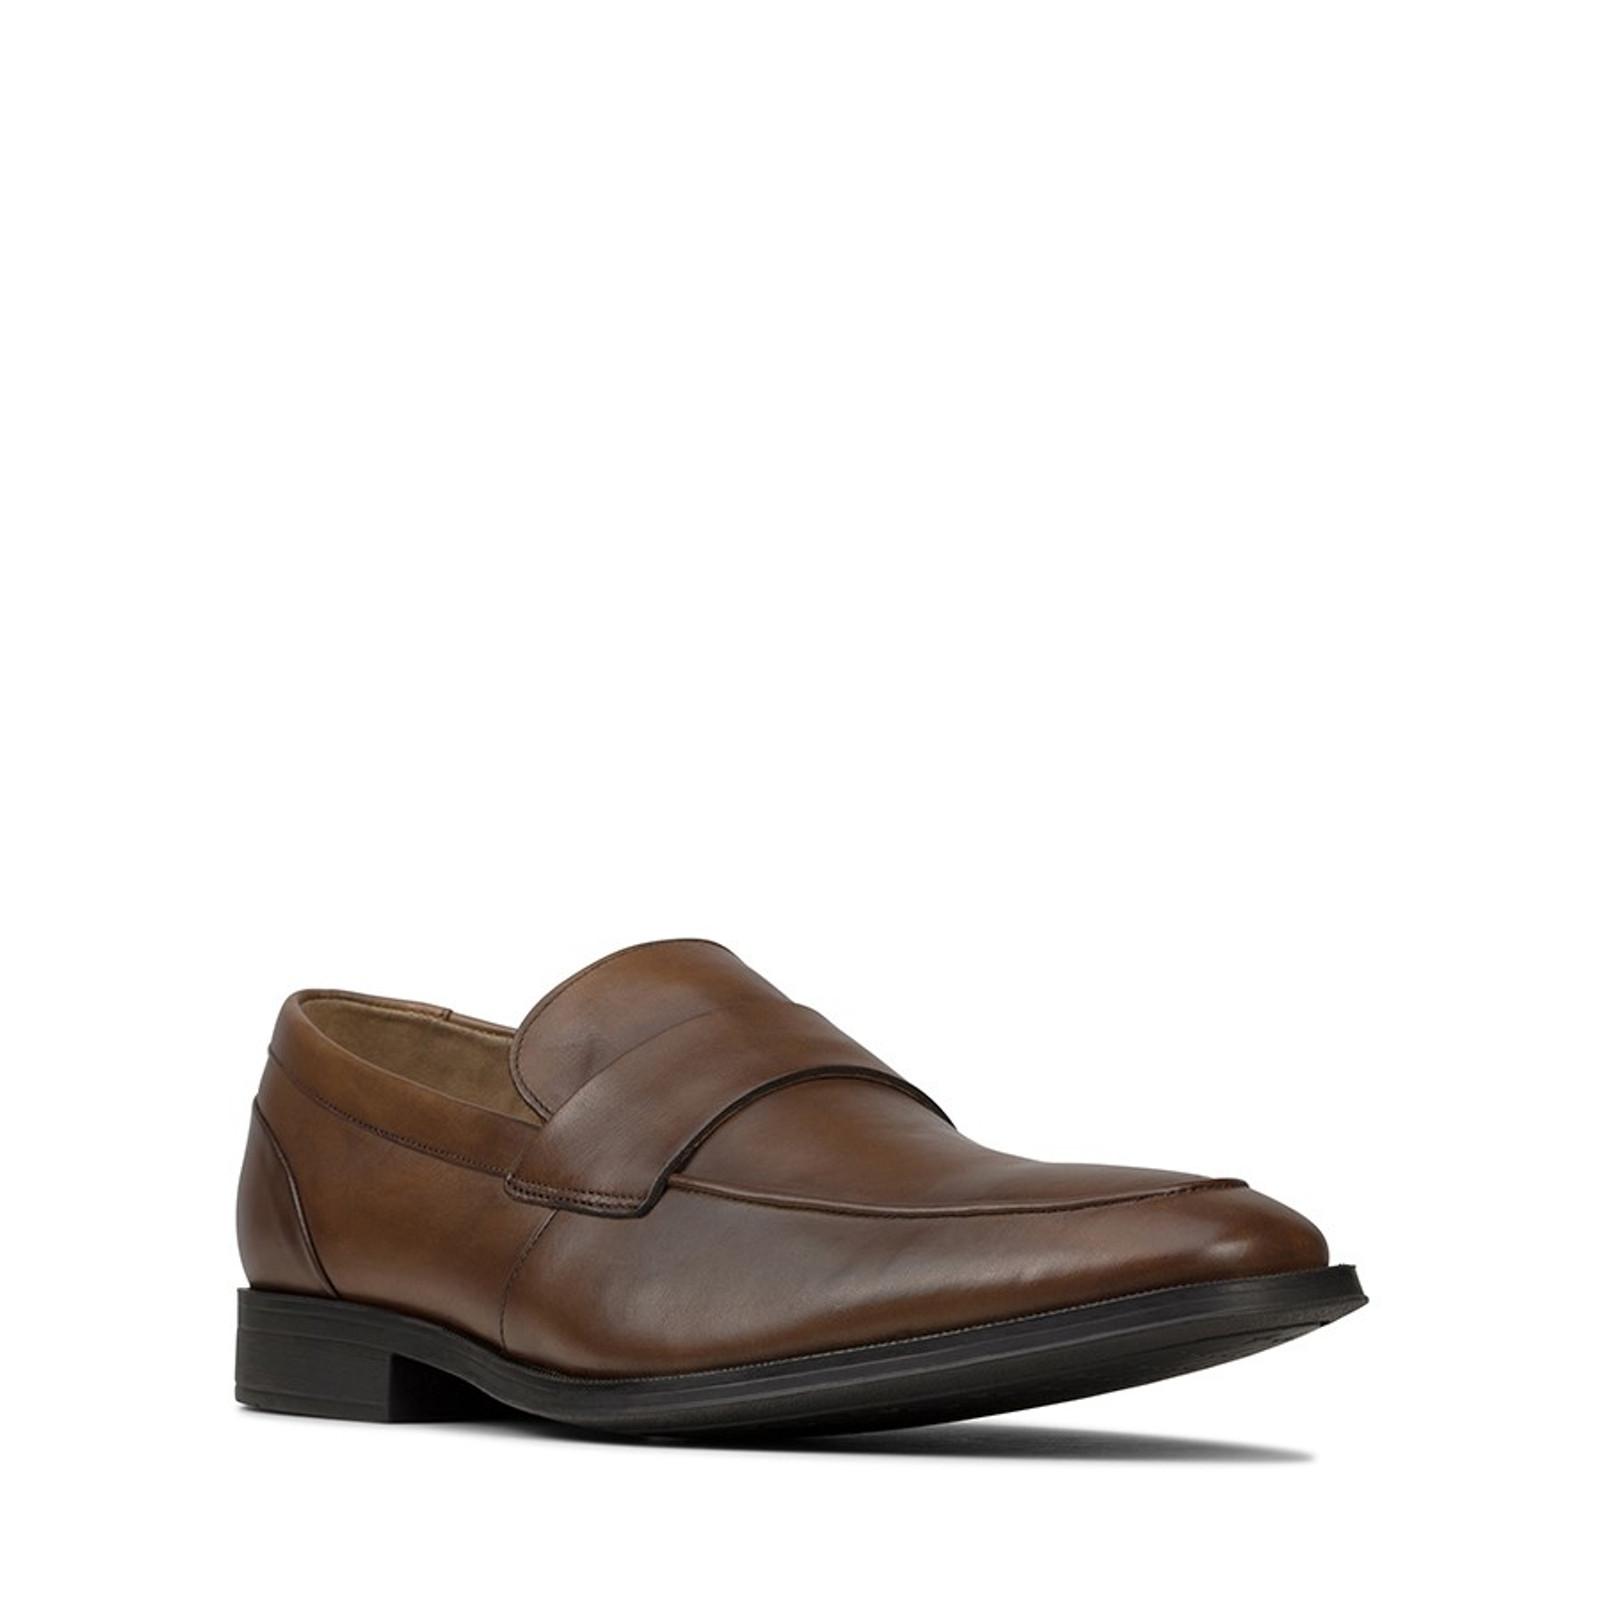 Clarks Mens GILMAN FREE Tan Leather